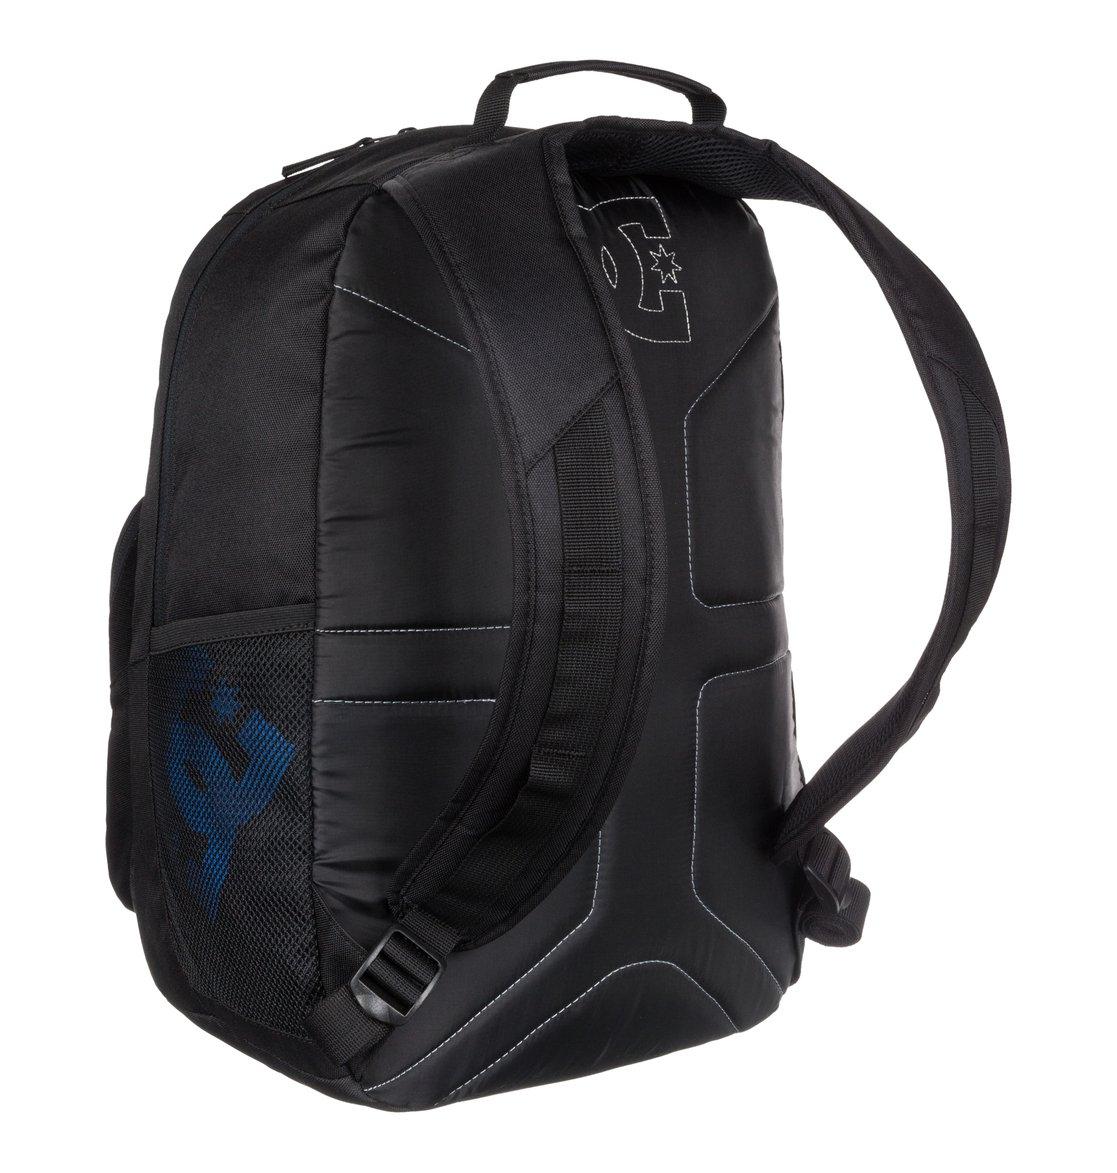 ebe3360b22e 2 Detention Backpack ADYBP00007 DC Shoes